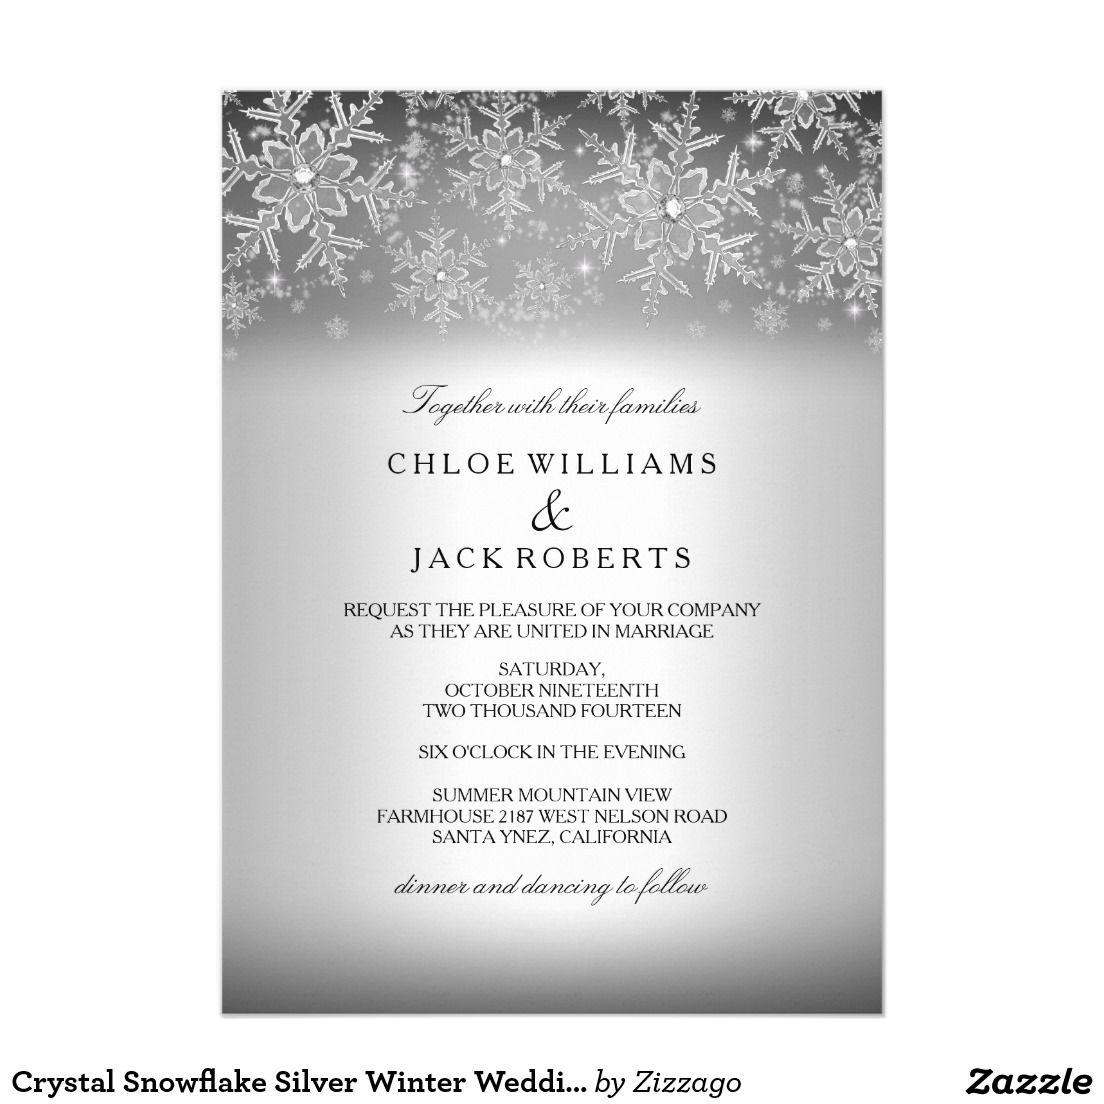 Winter Wedding Invitations Cheap: Crystal Snowflake Silver Winter Wedding Invitation